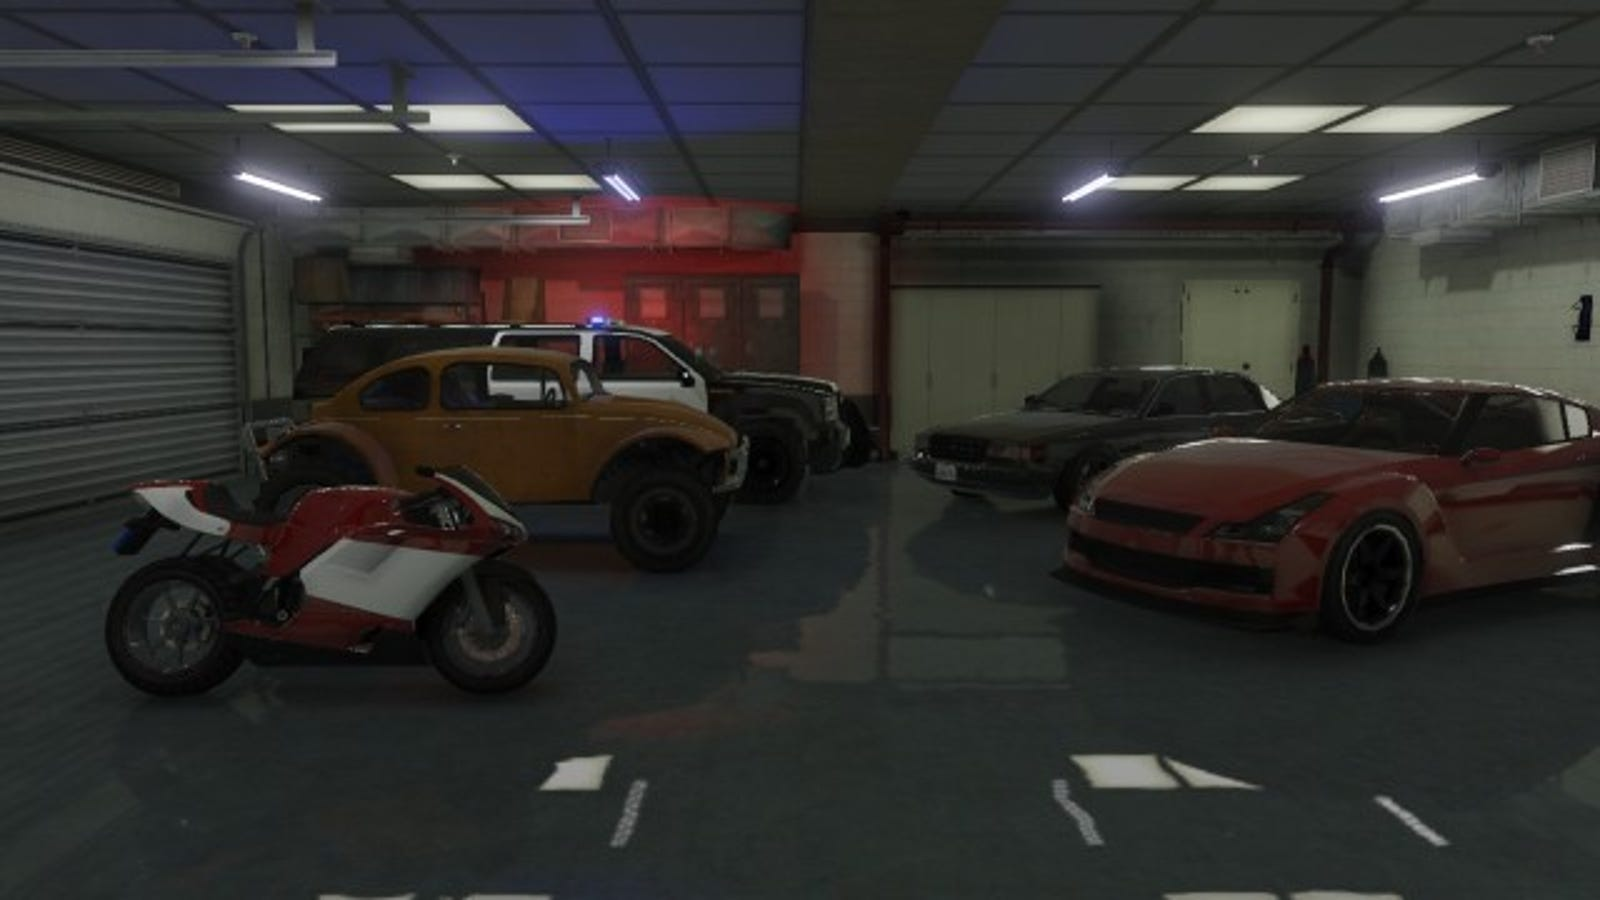 Let's See Your GTA Online Garage